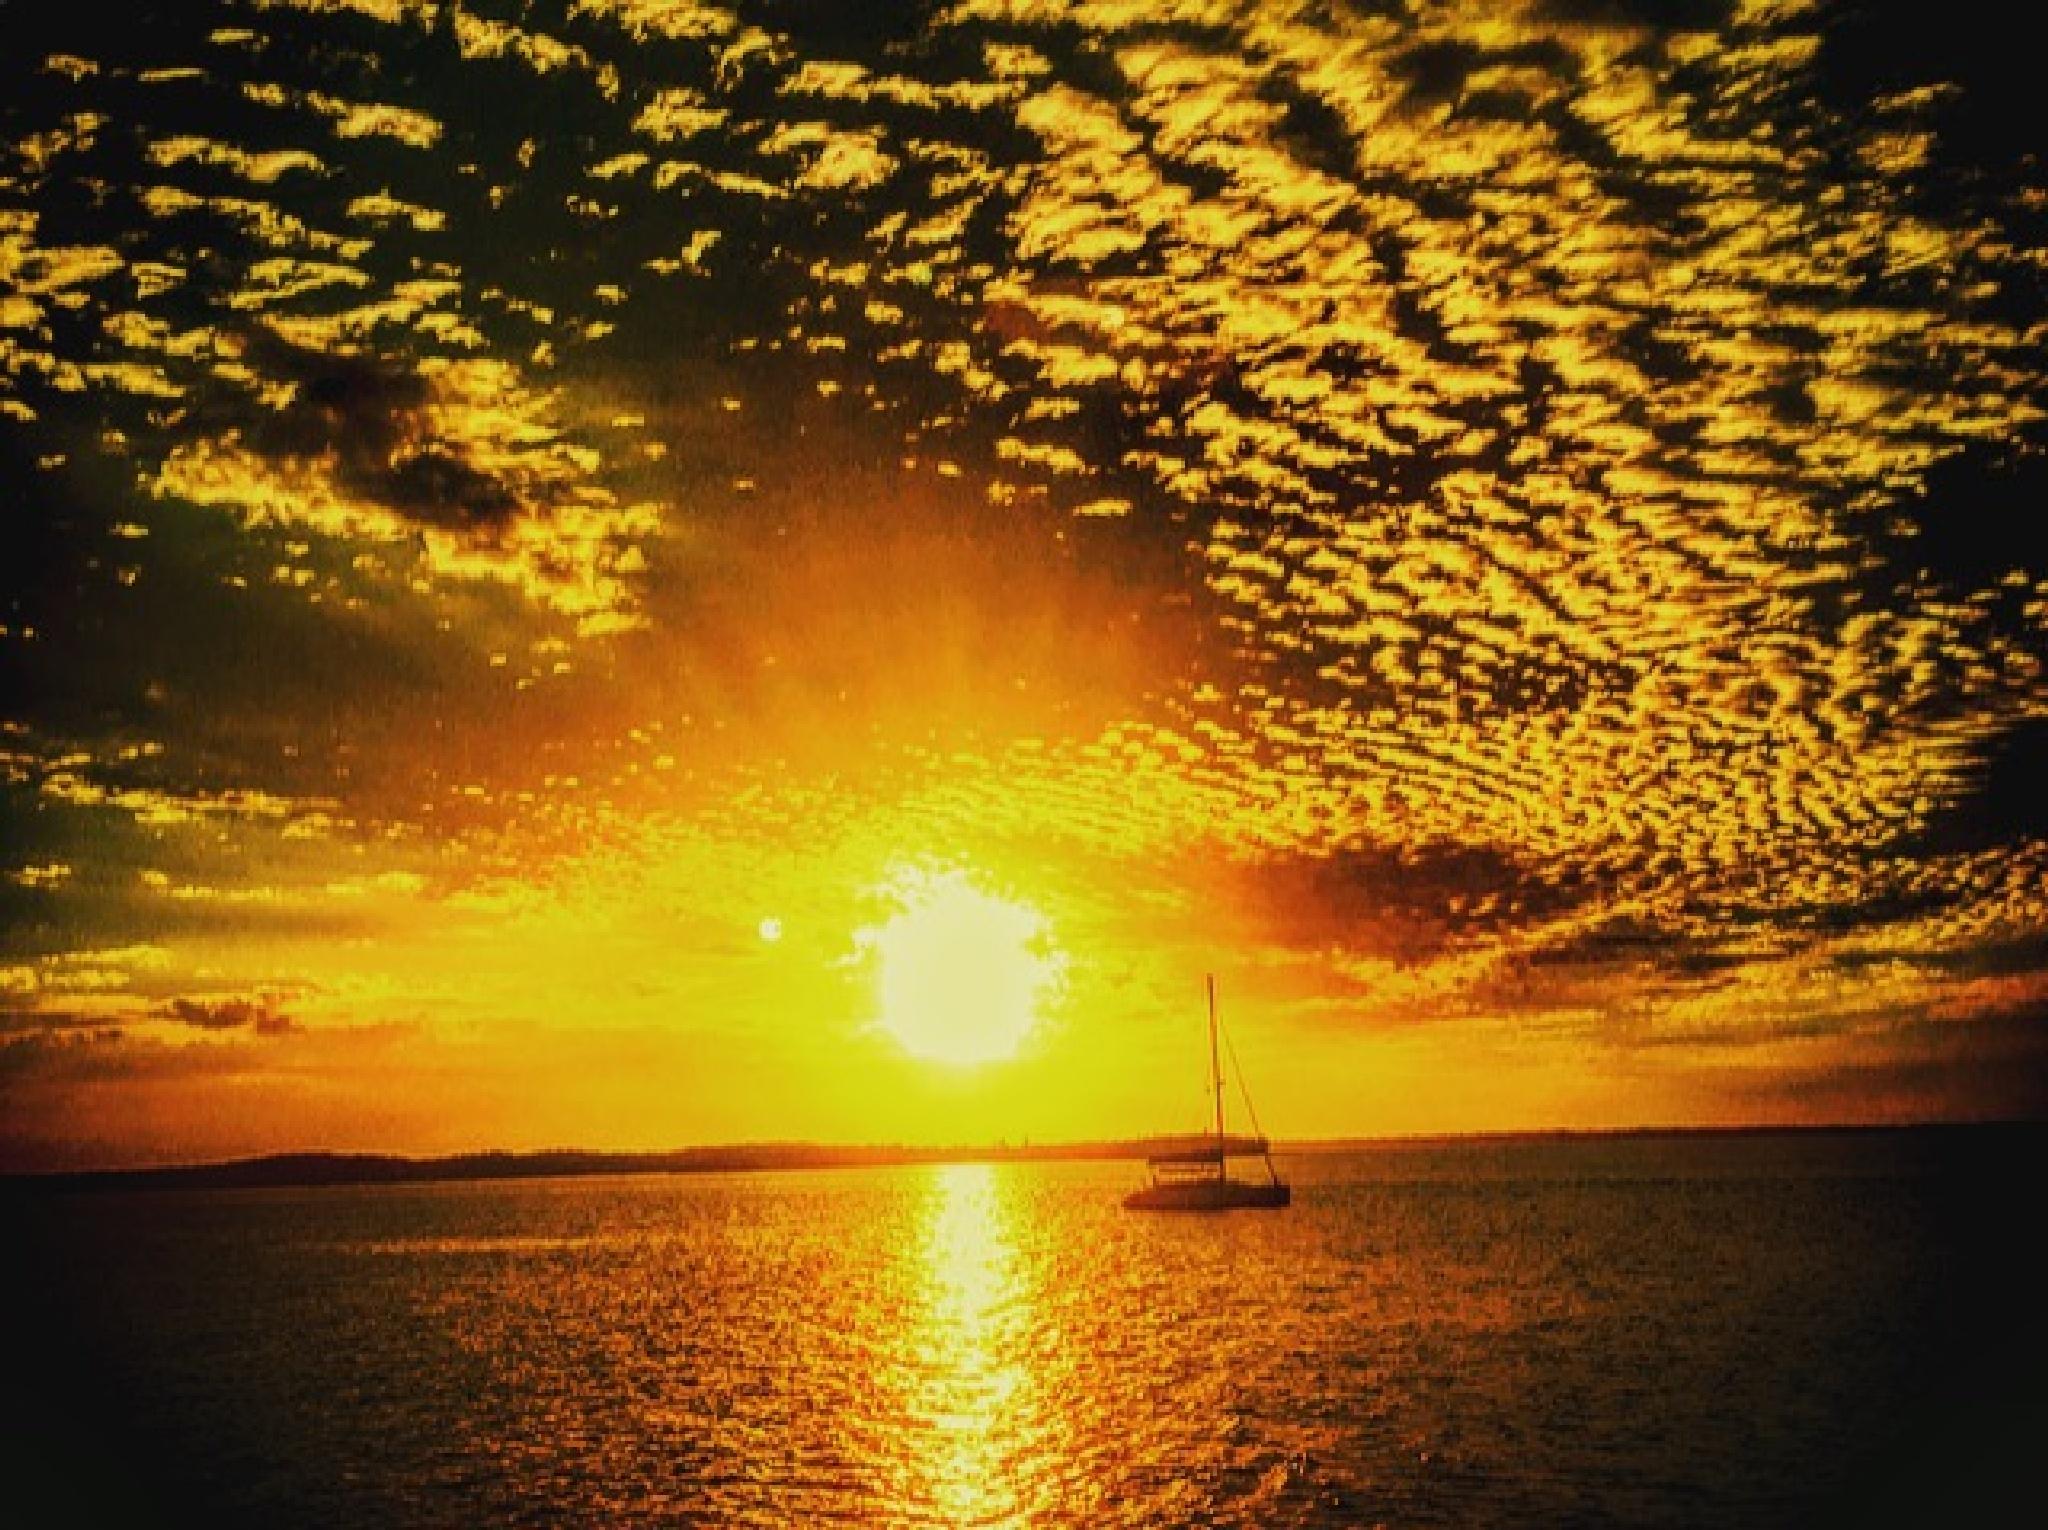 Sunset Sail by Stevie Lynn